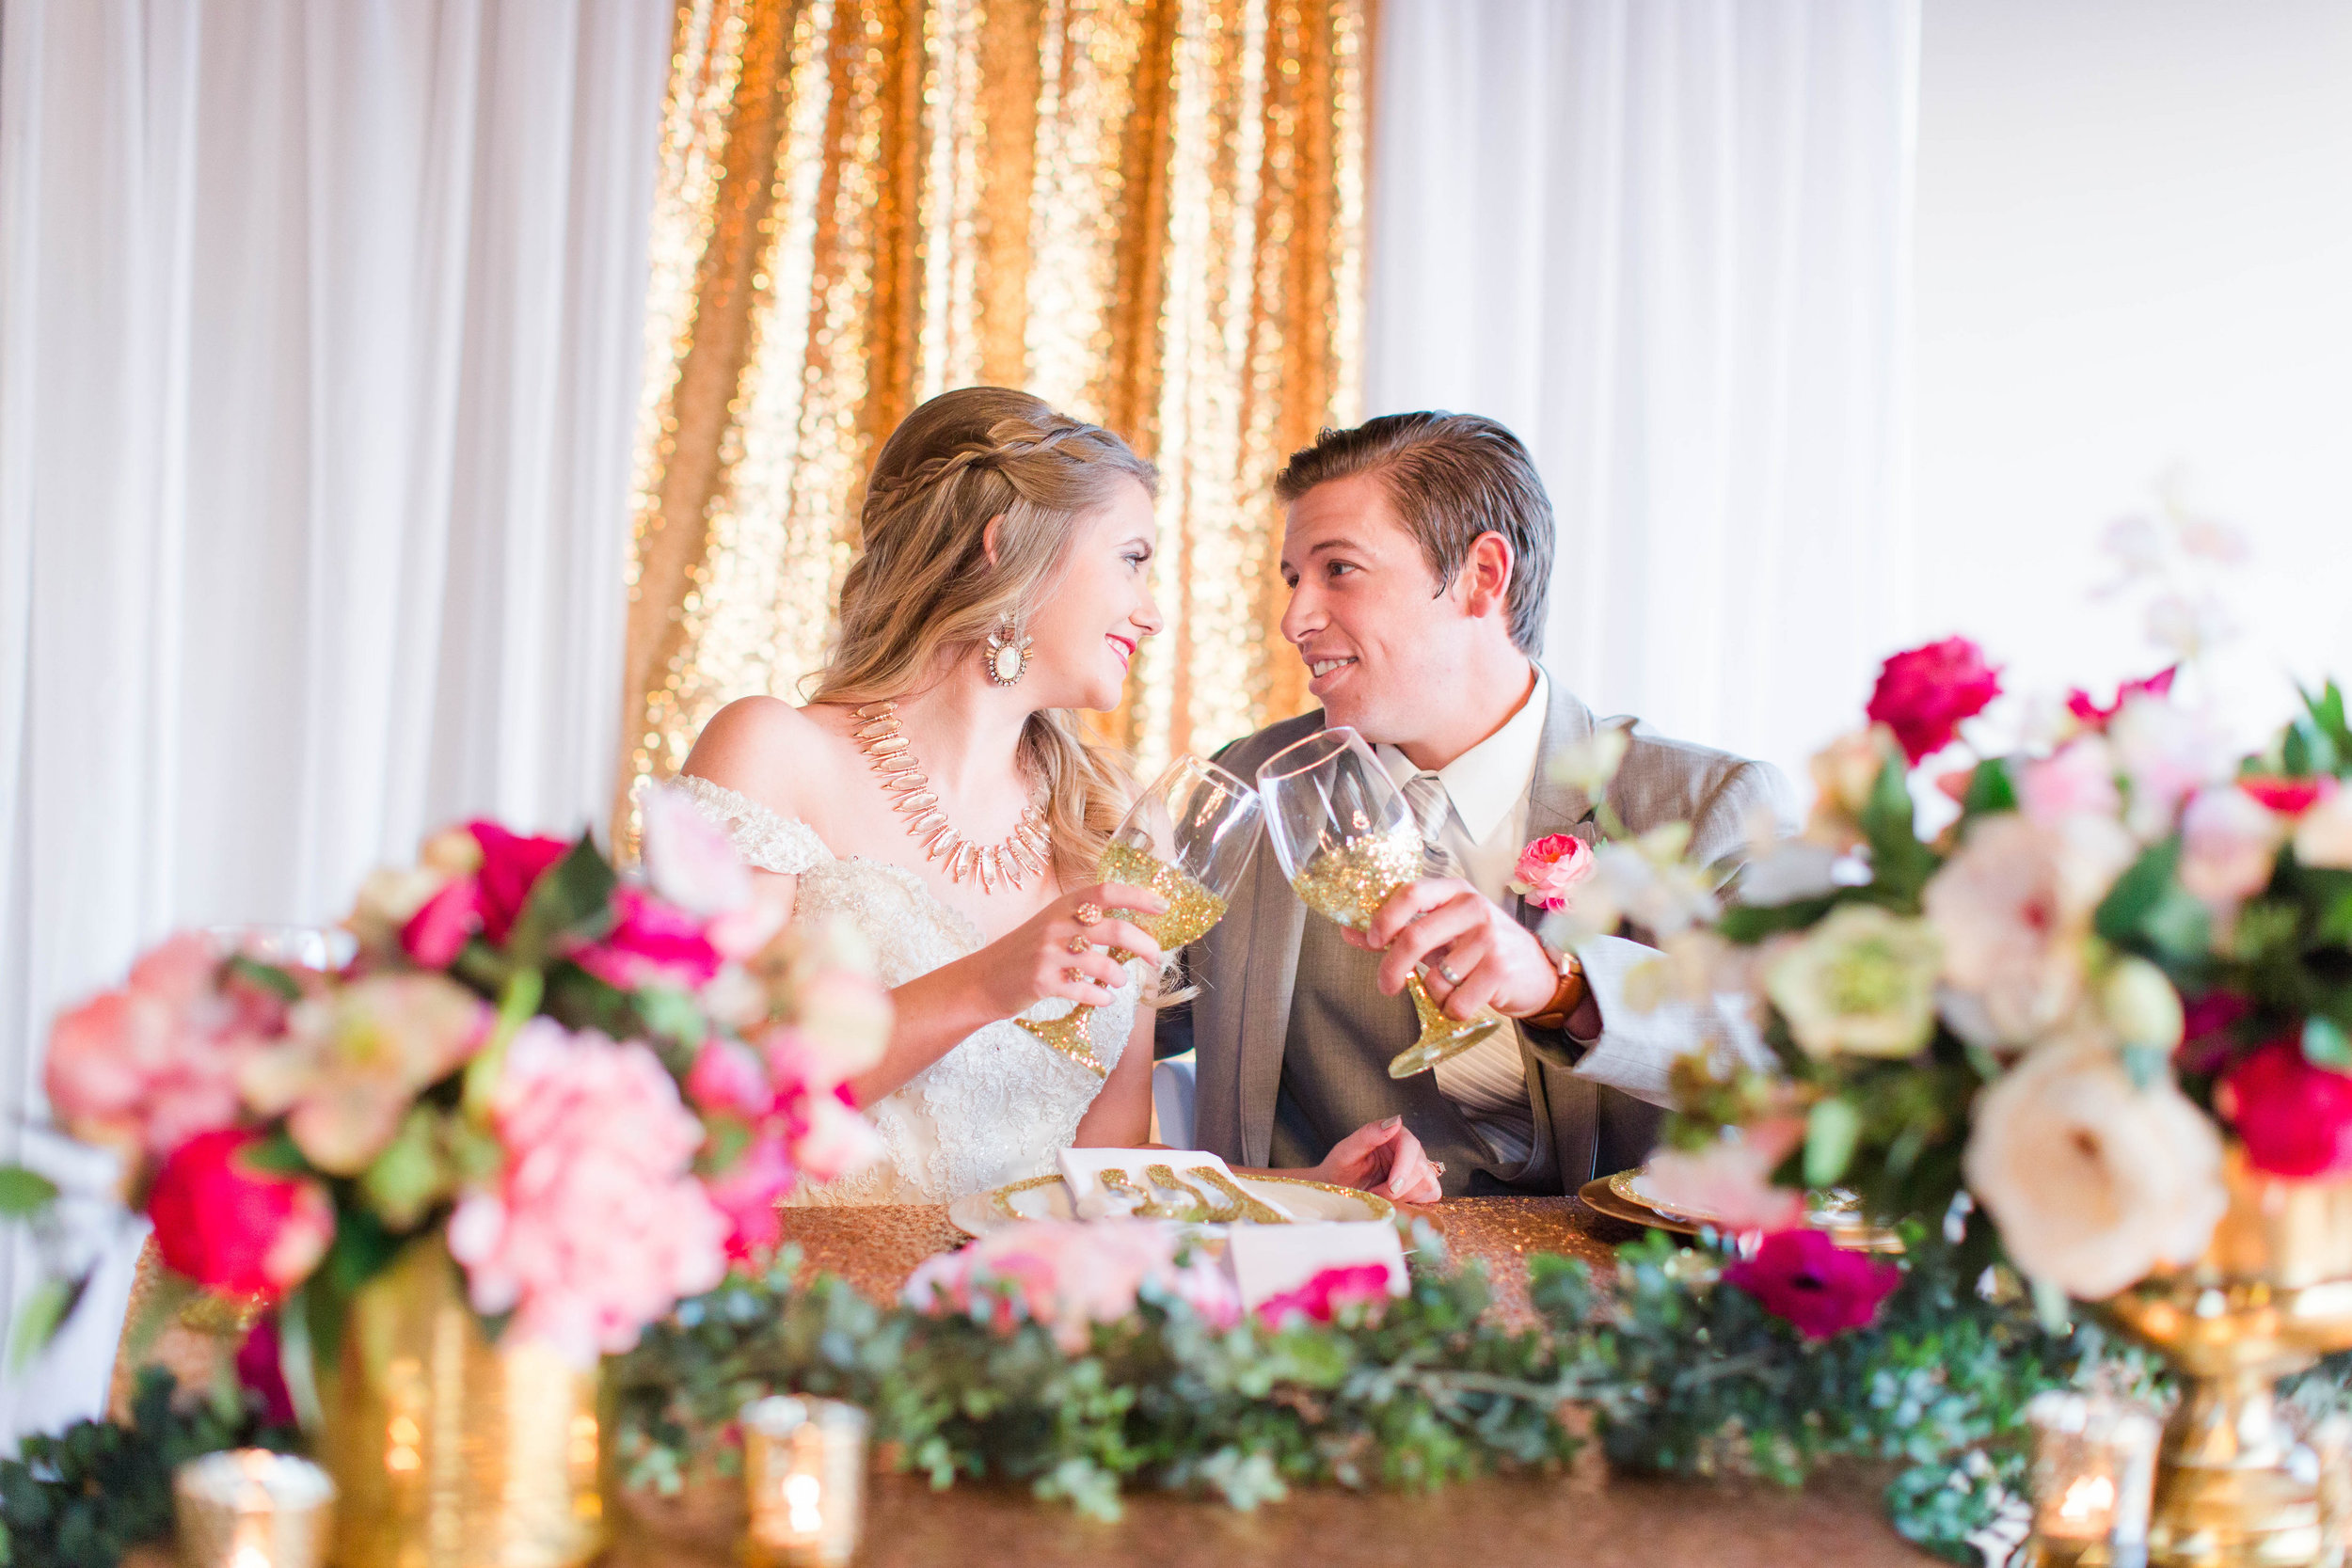 afloral-fake-flower-wedding-ivory-and-beau-bridal-boutique-maggie-sottero-saffron-the-hall-on-vine-wedding-statesboro-wedding-savannah-wedding-kristian-designs-rachel-strickland-photography-savannah-bridal-southern-bride-savannah-bride-25.jpg